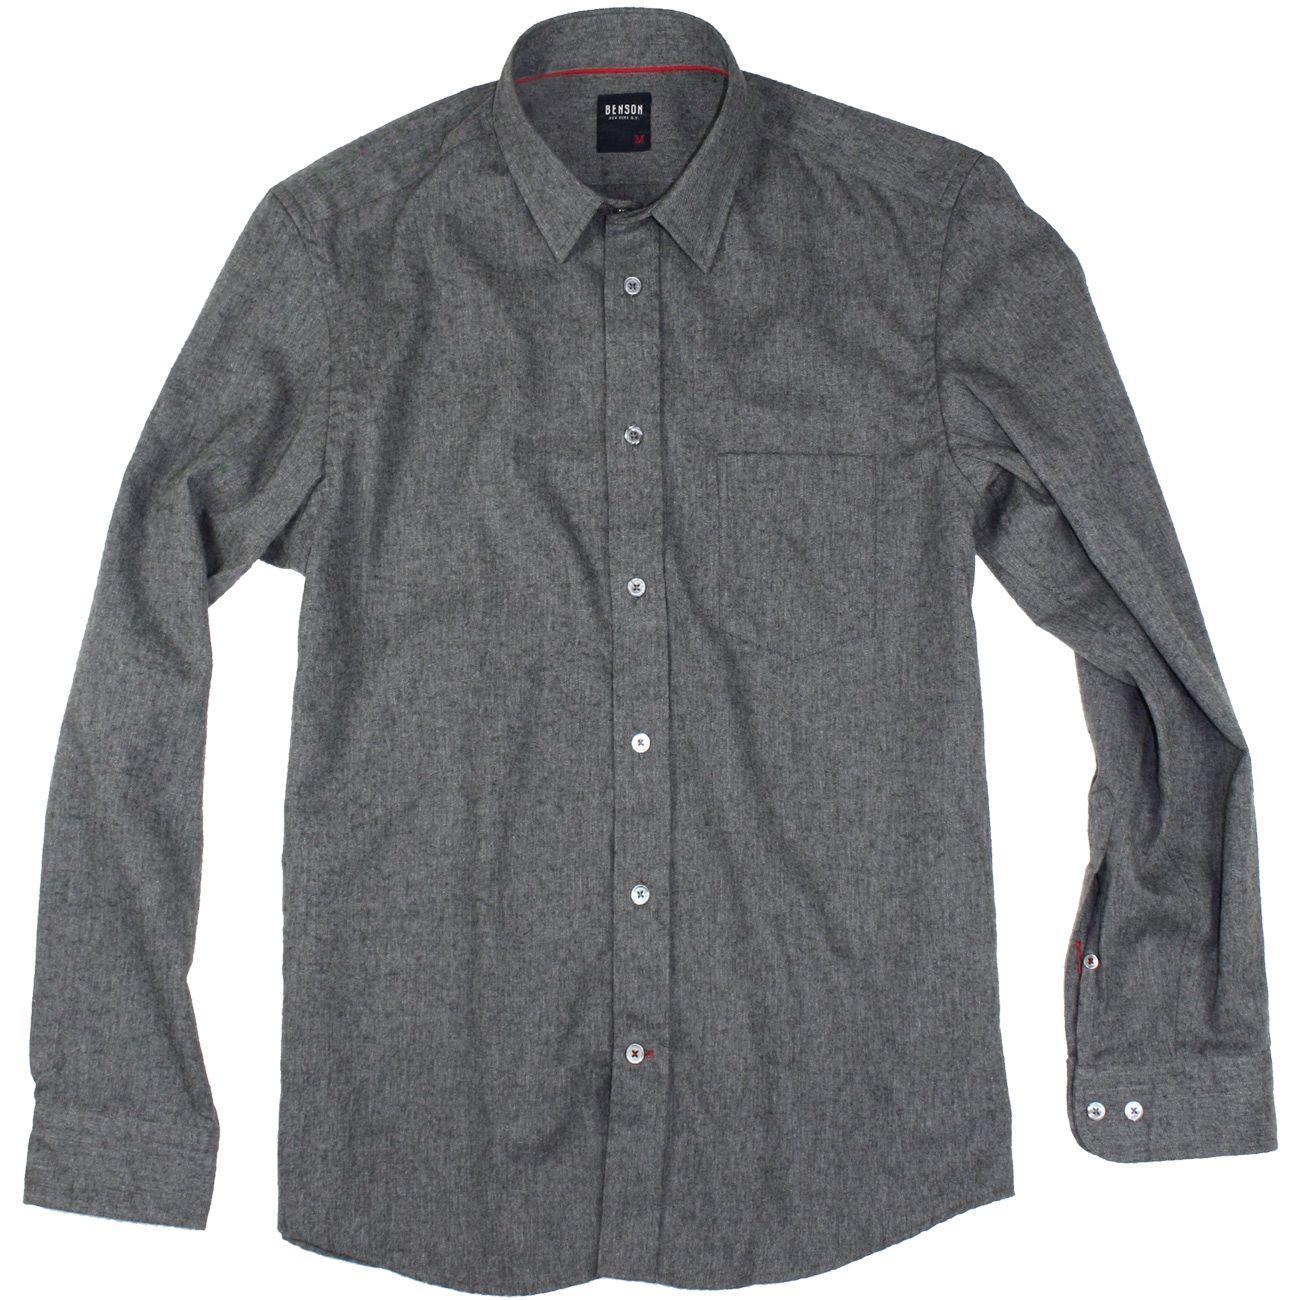 Flannel under shirt  Charcoal Cotton Flannel Shirt by BENSON  Flannel shirts Flannels